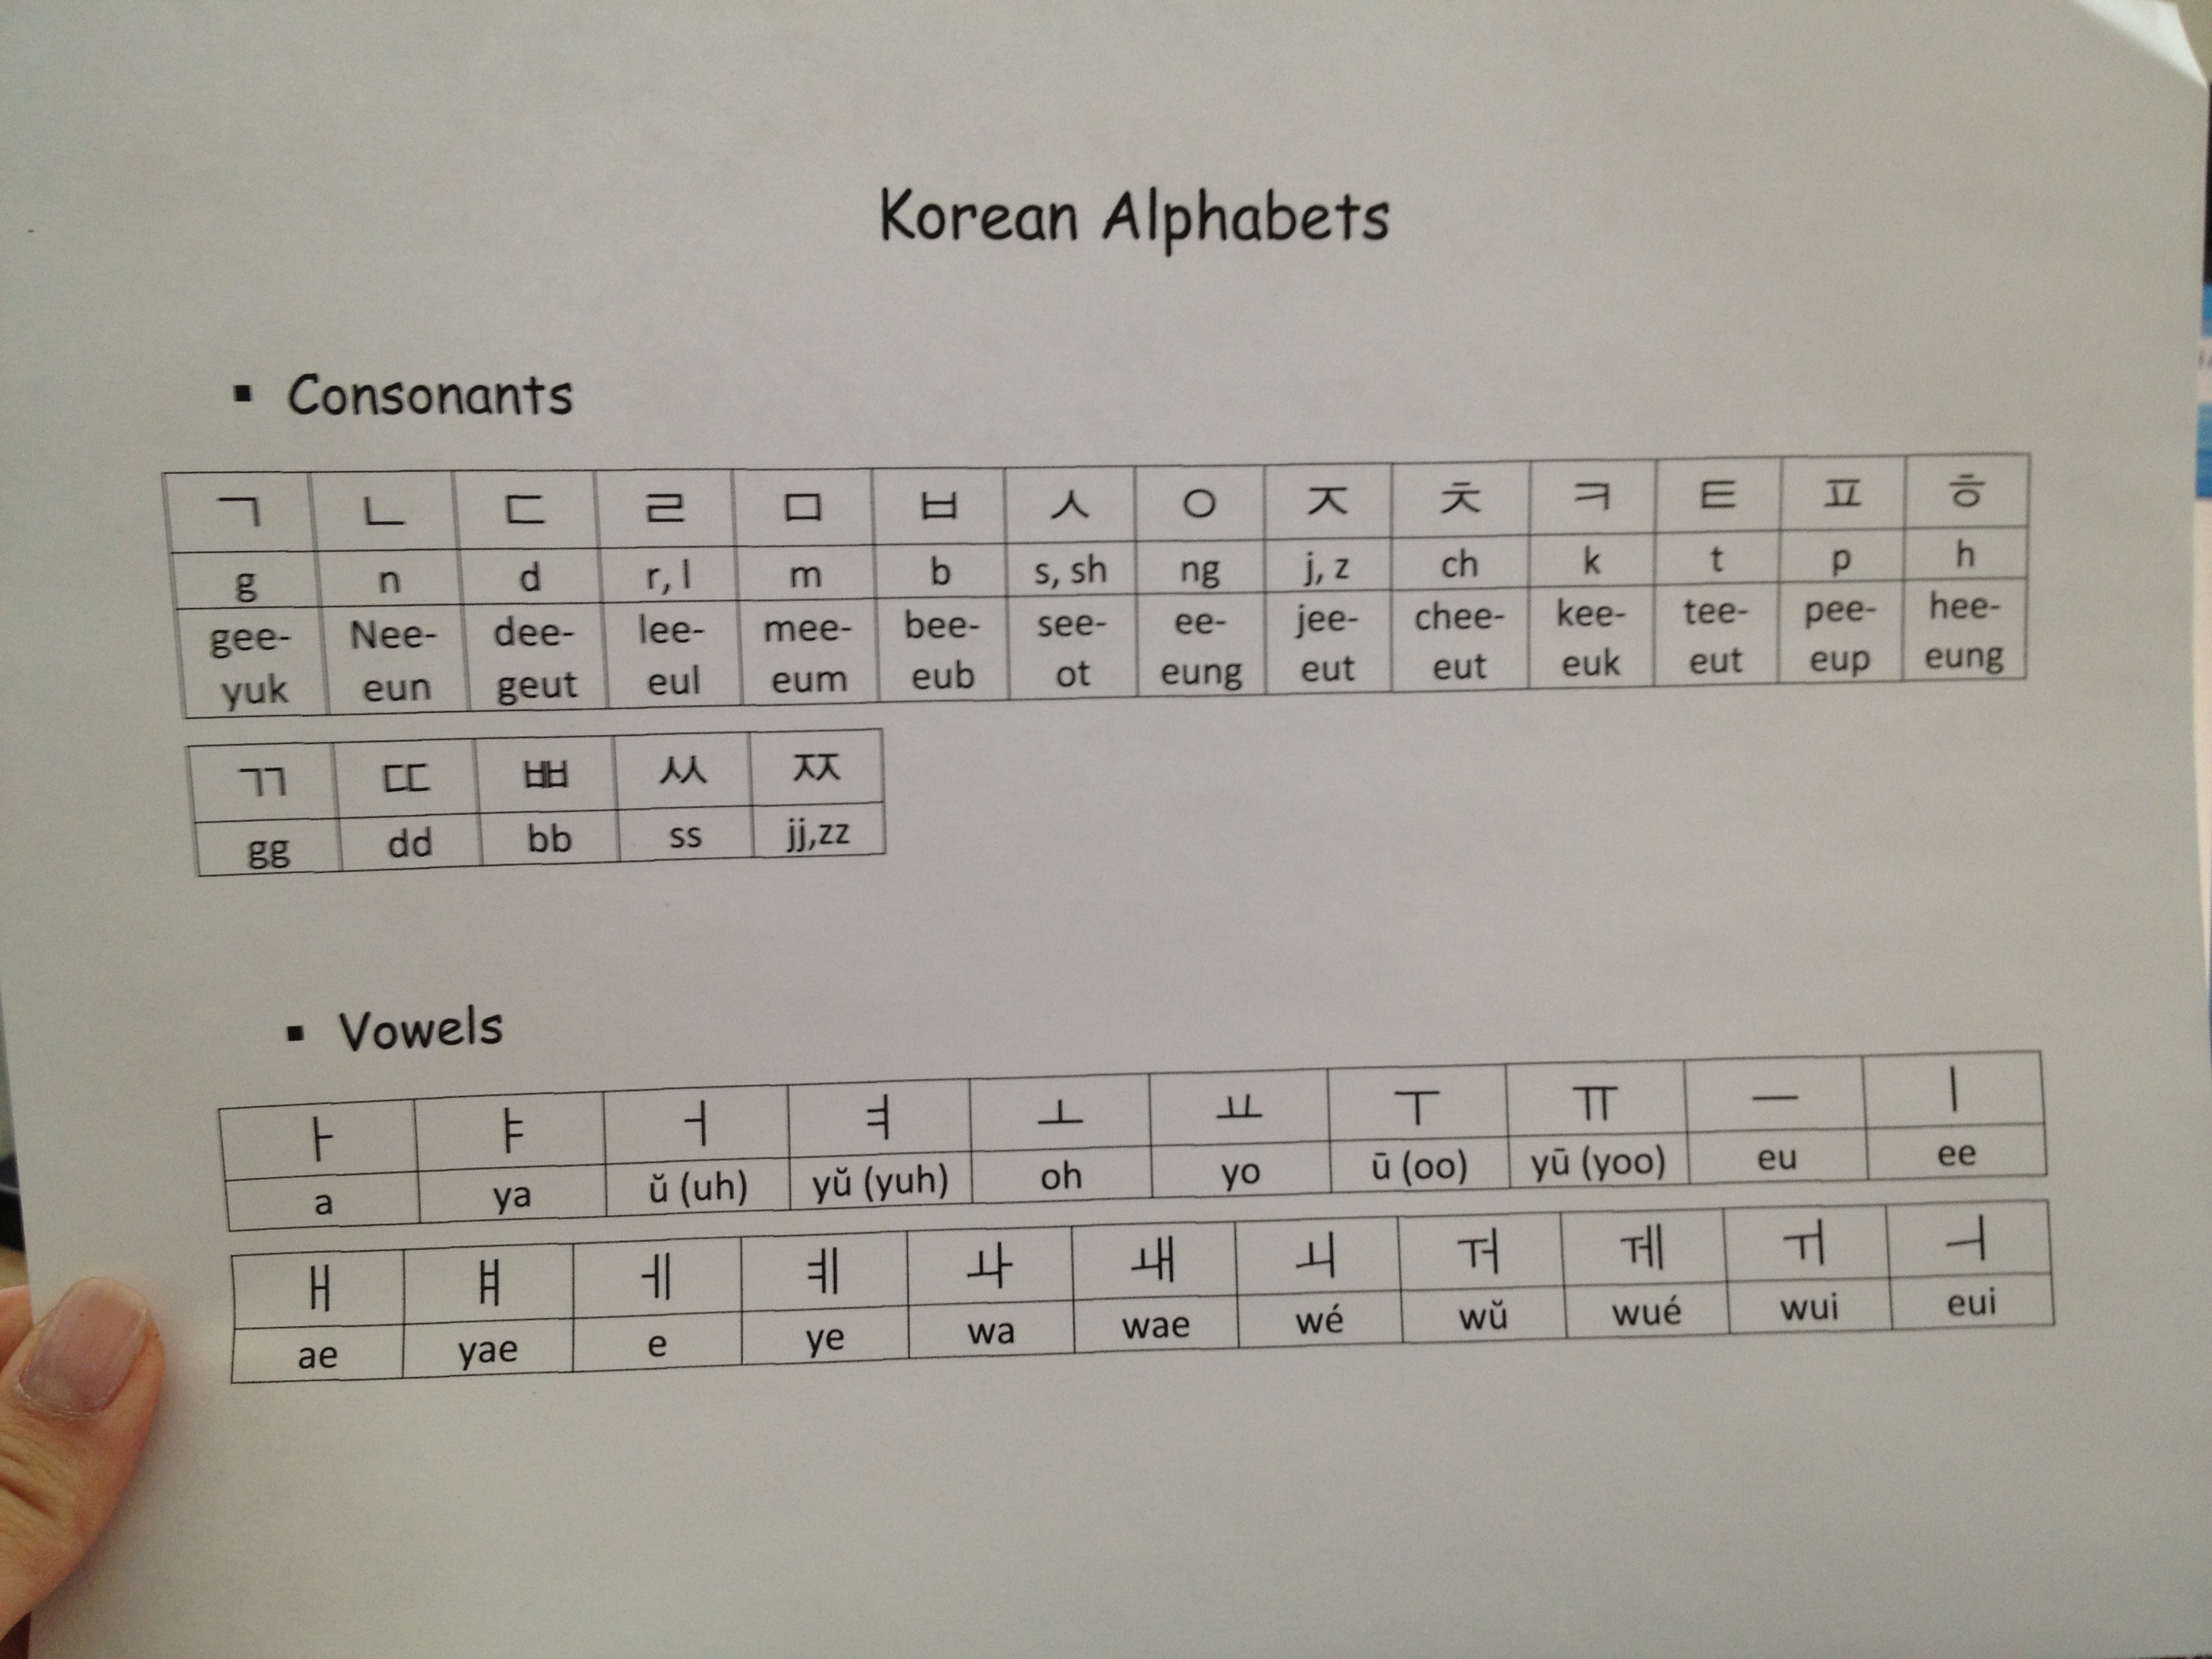 Korean Alphabets Chart